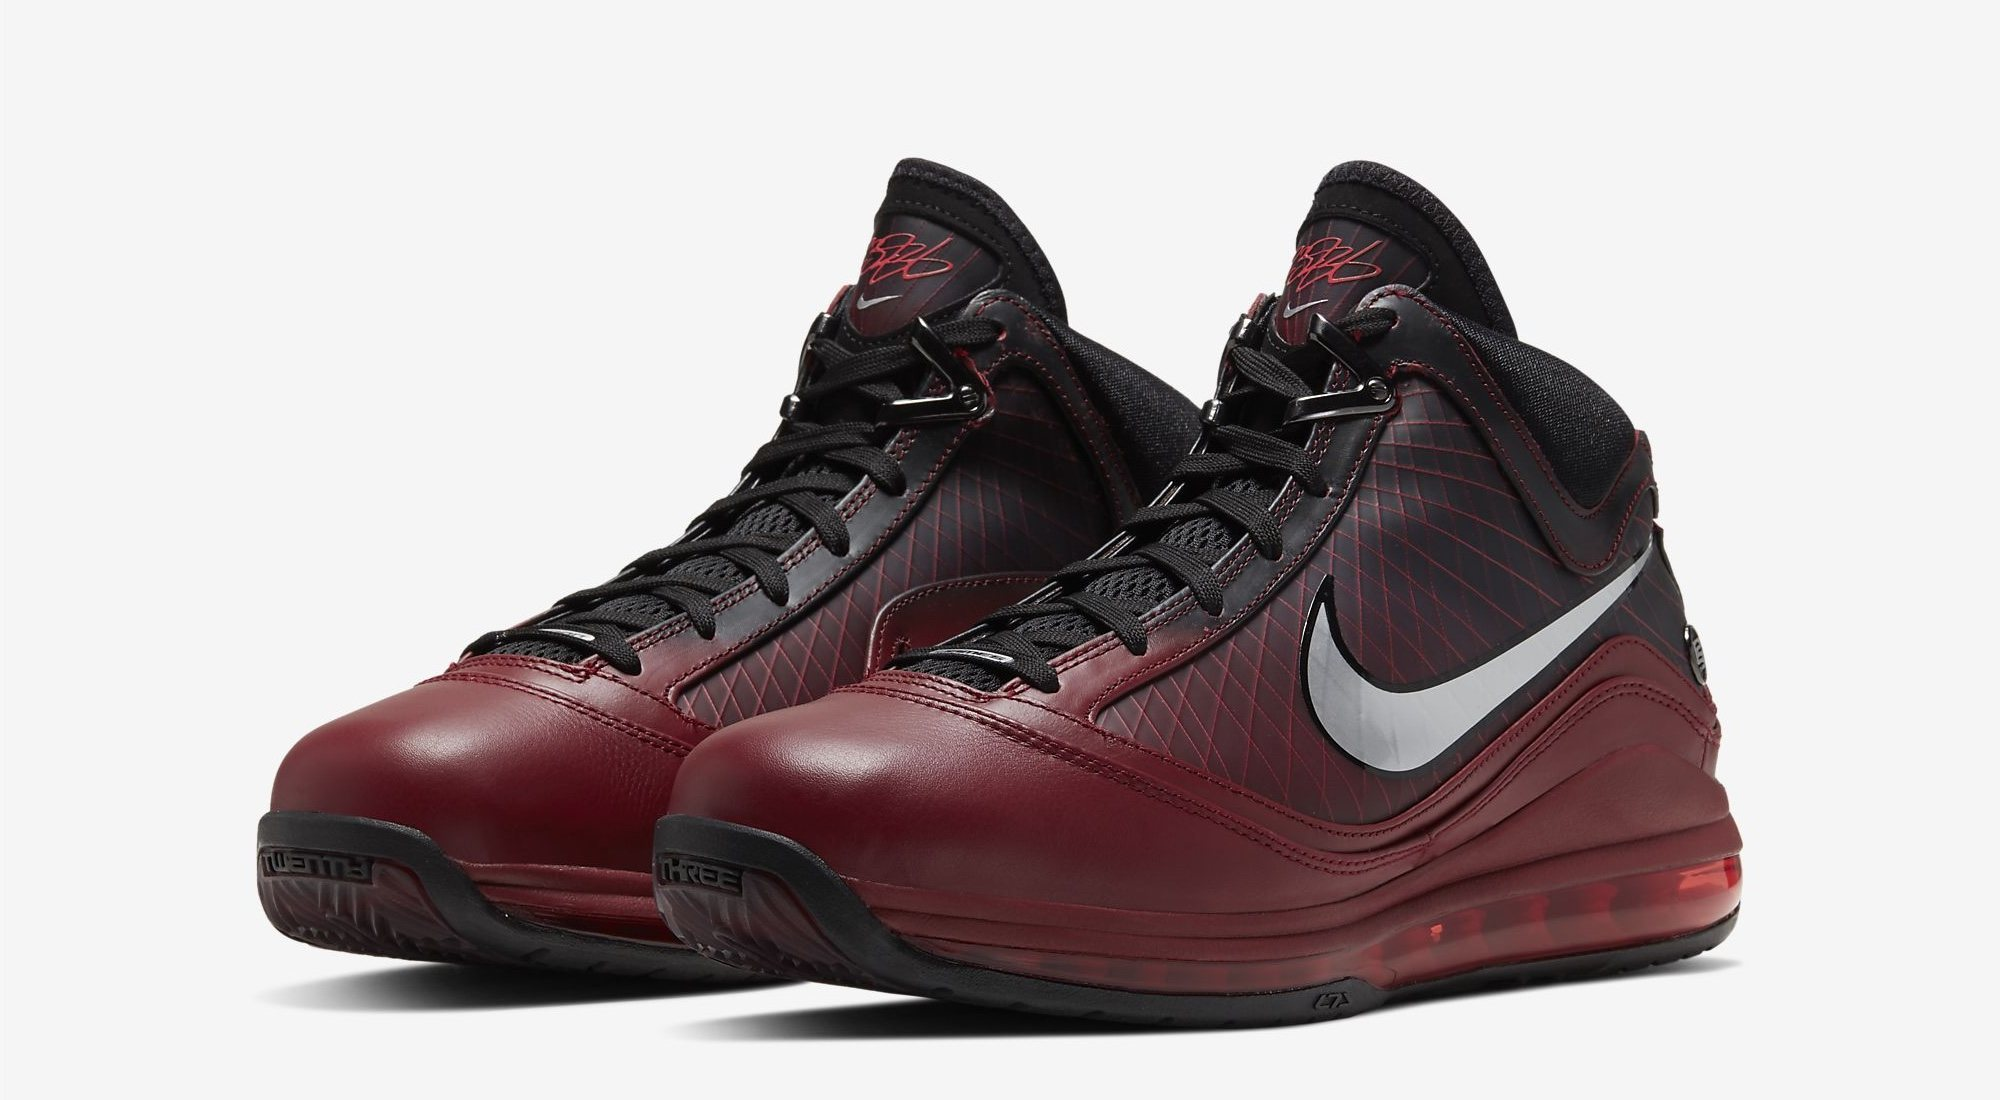 LeBron VII Christmas Retro, las botas de Nike para la Navidad